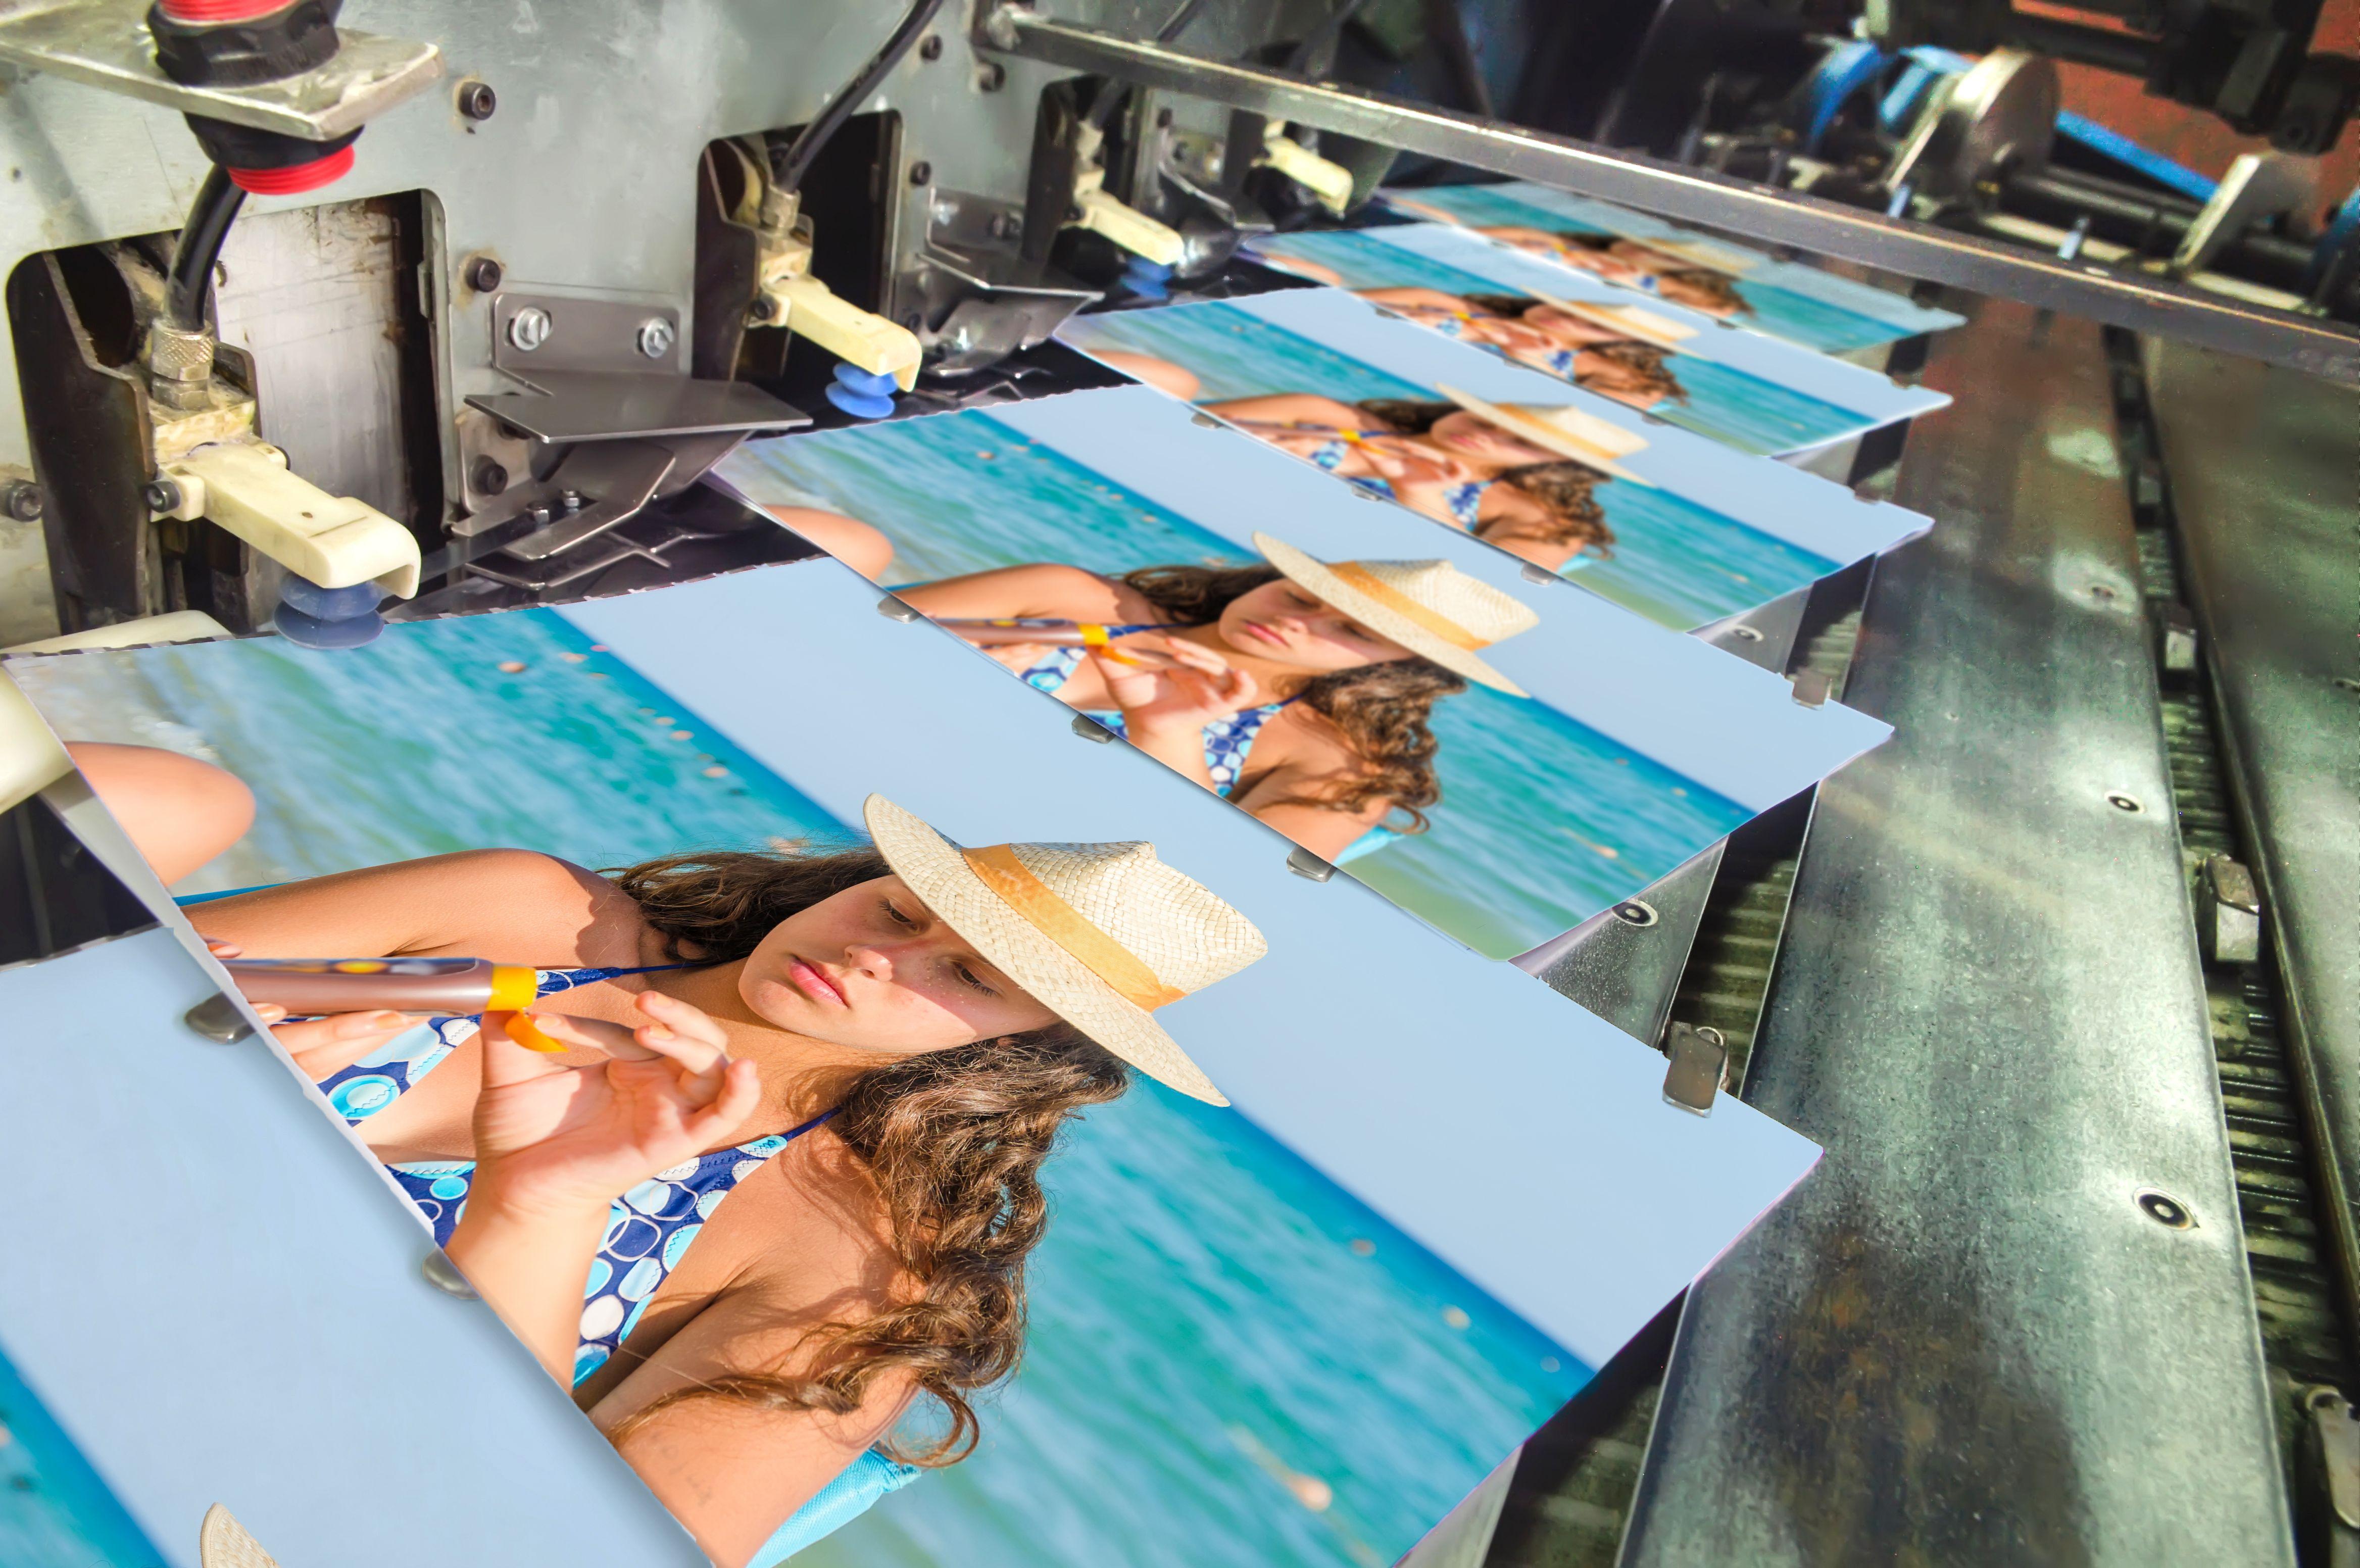 Impresión de fotografías en Zaragoza